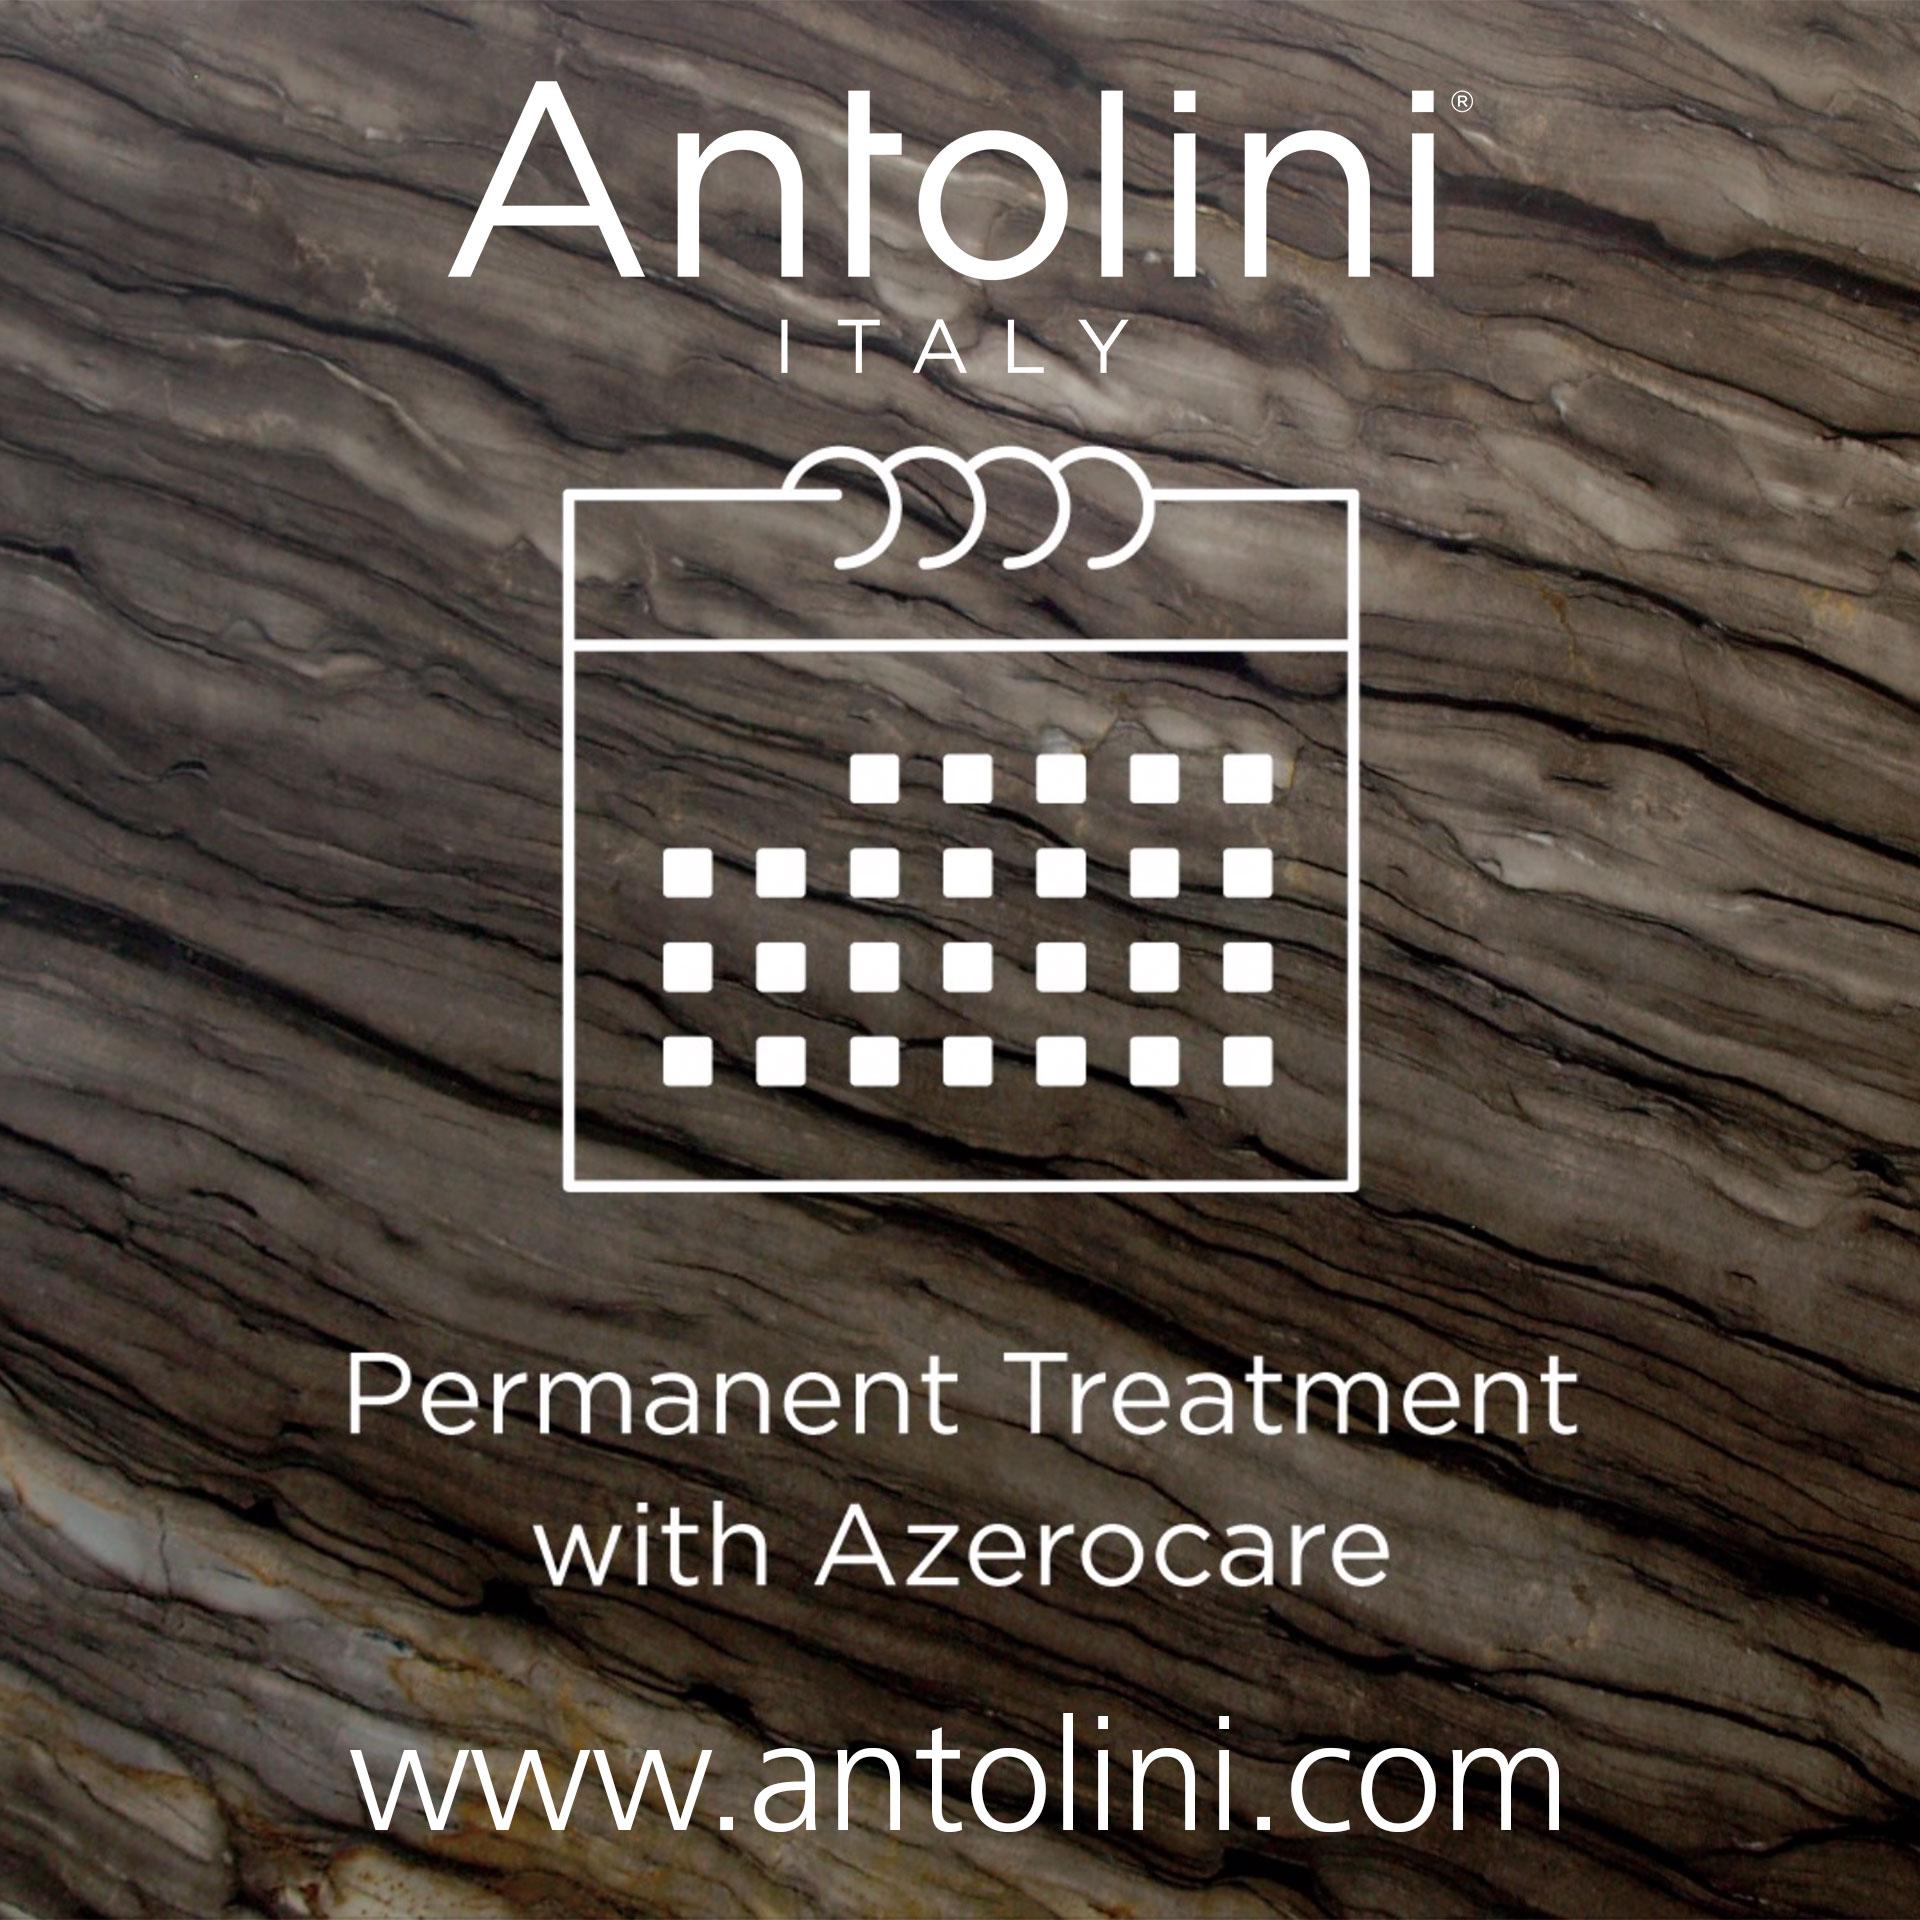 Antolini_ZeroCare_Seqouia-Brown